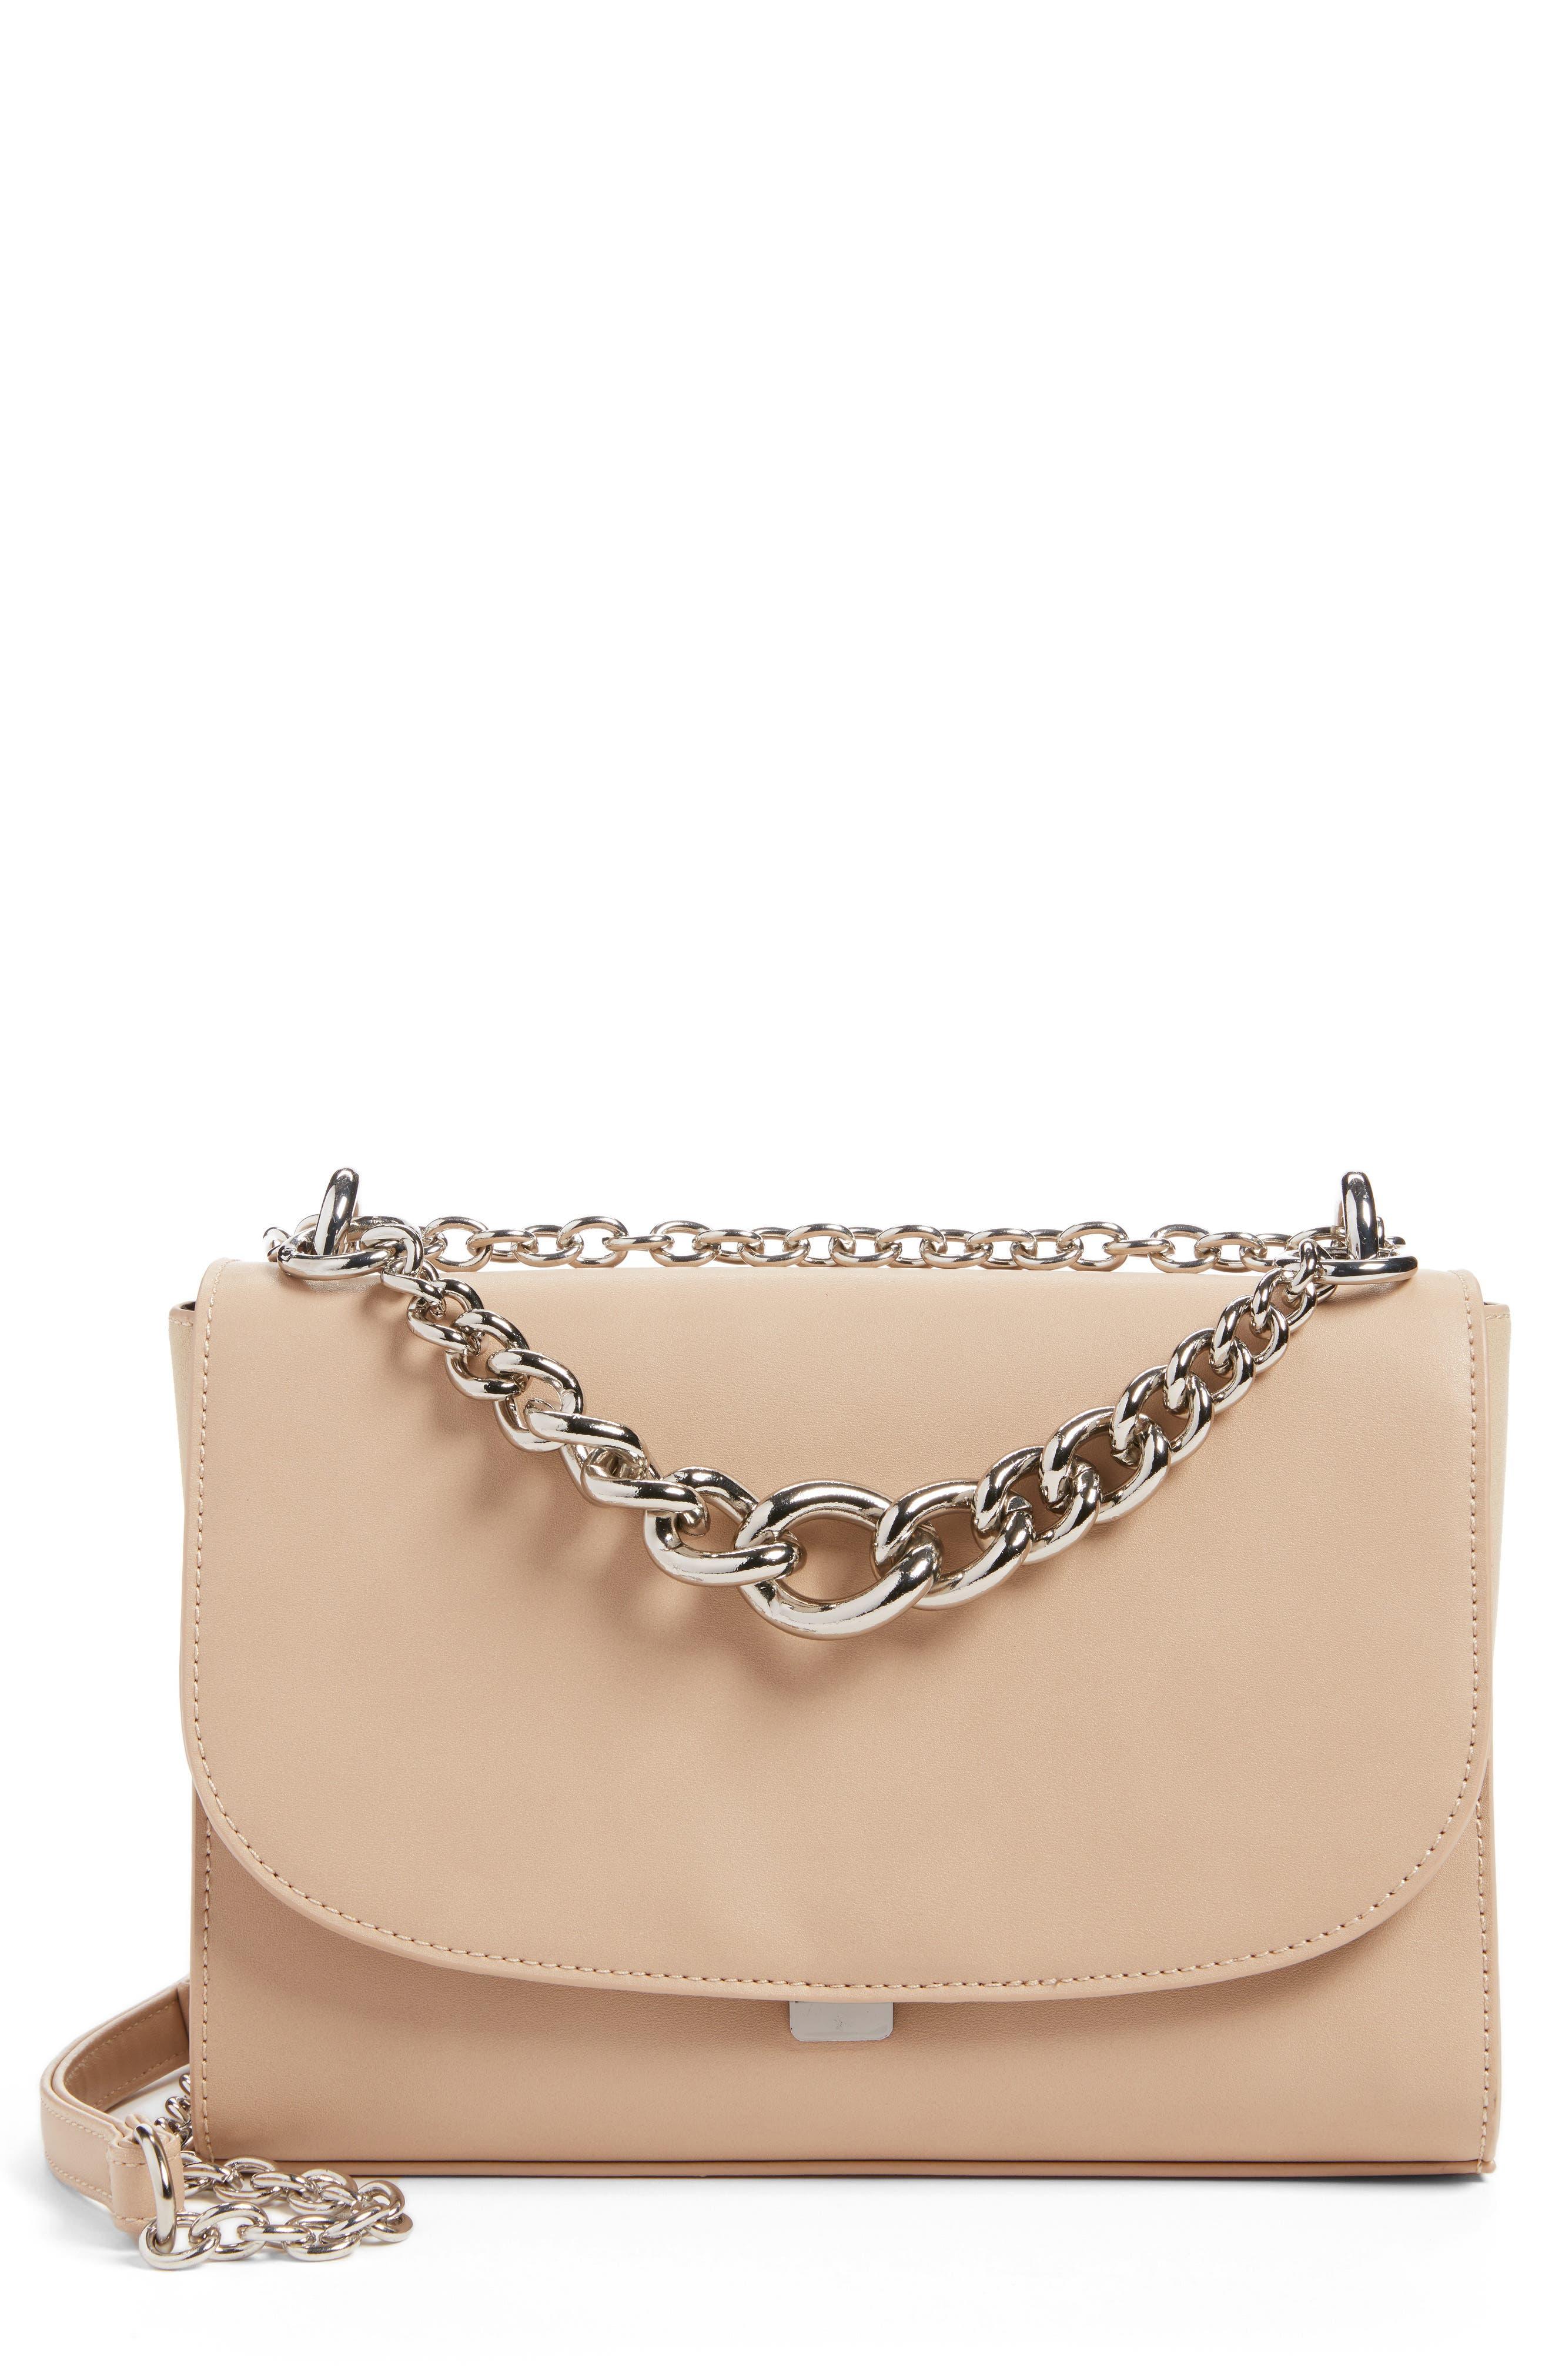 Chelsea28 Chace Faux Leather Shoulder Bag